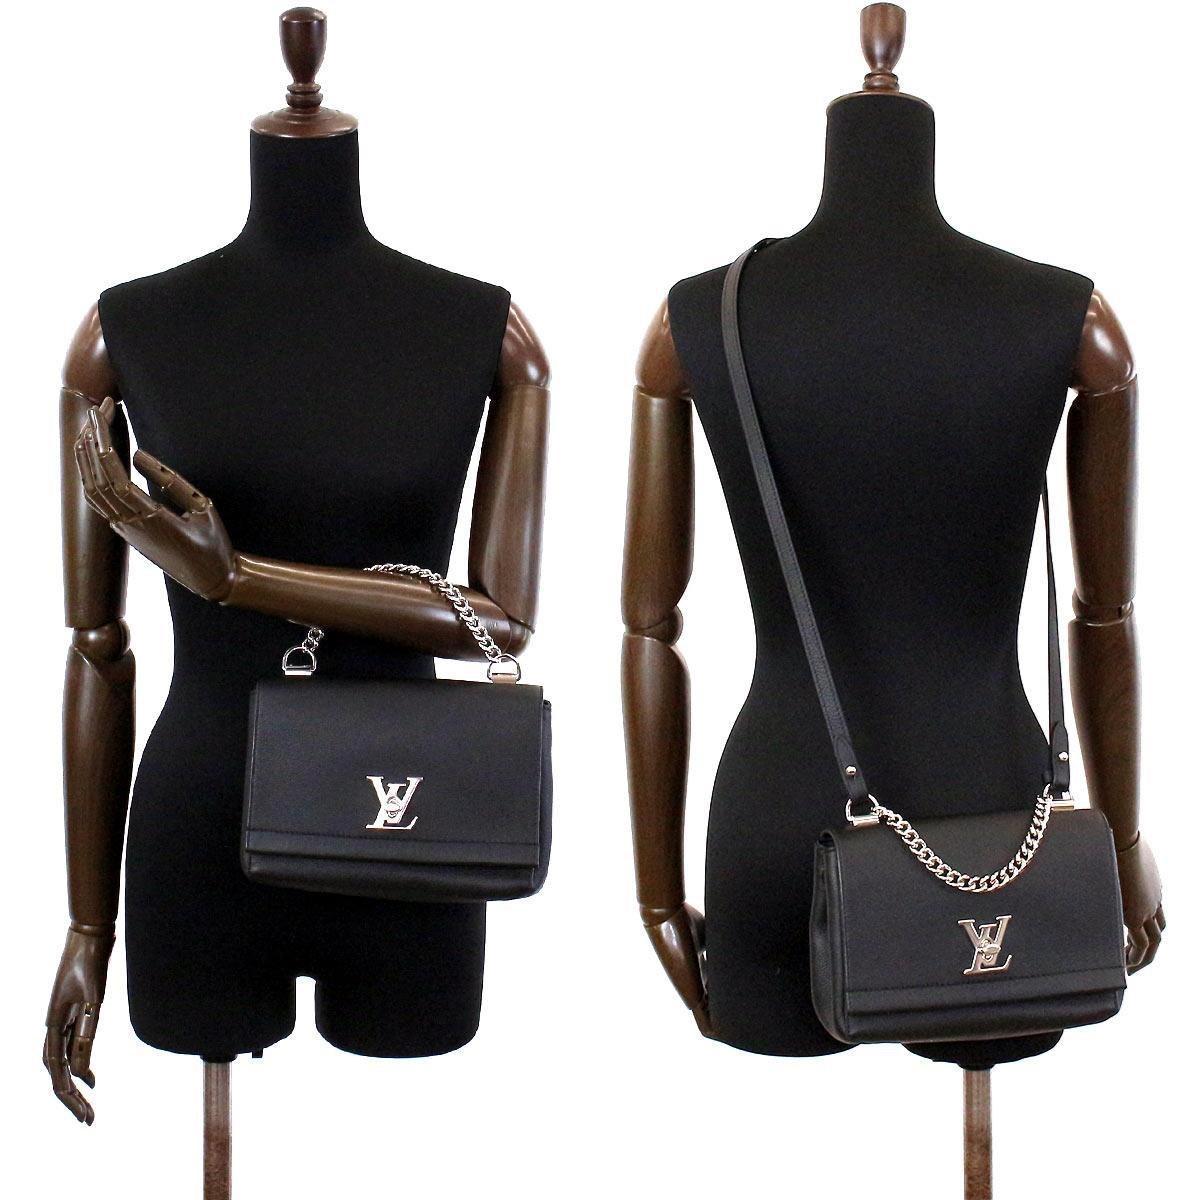 598e92ded243 Gallery. Previously sold at  Reebonz · Women s Box Bags Women s Dolce  Gabbana Von Women s Michael By Michael Kors Jet Set Women s Louis Vuitton  ...